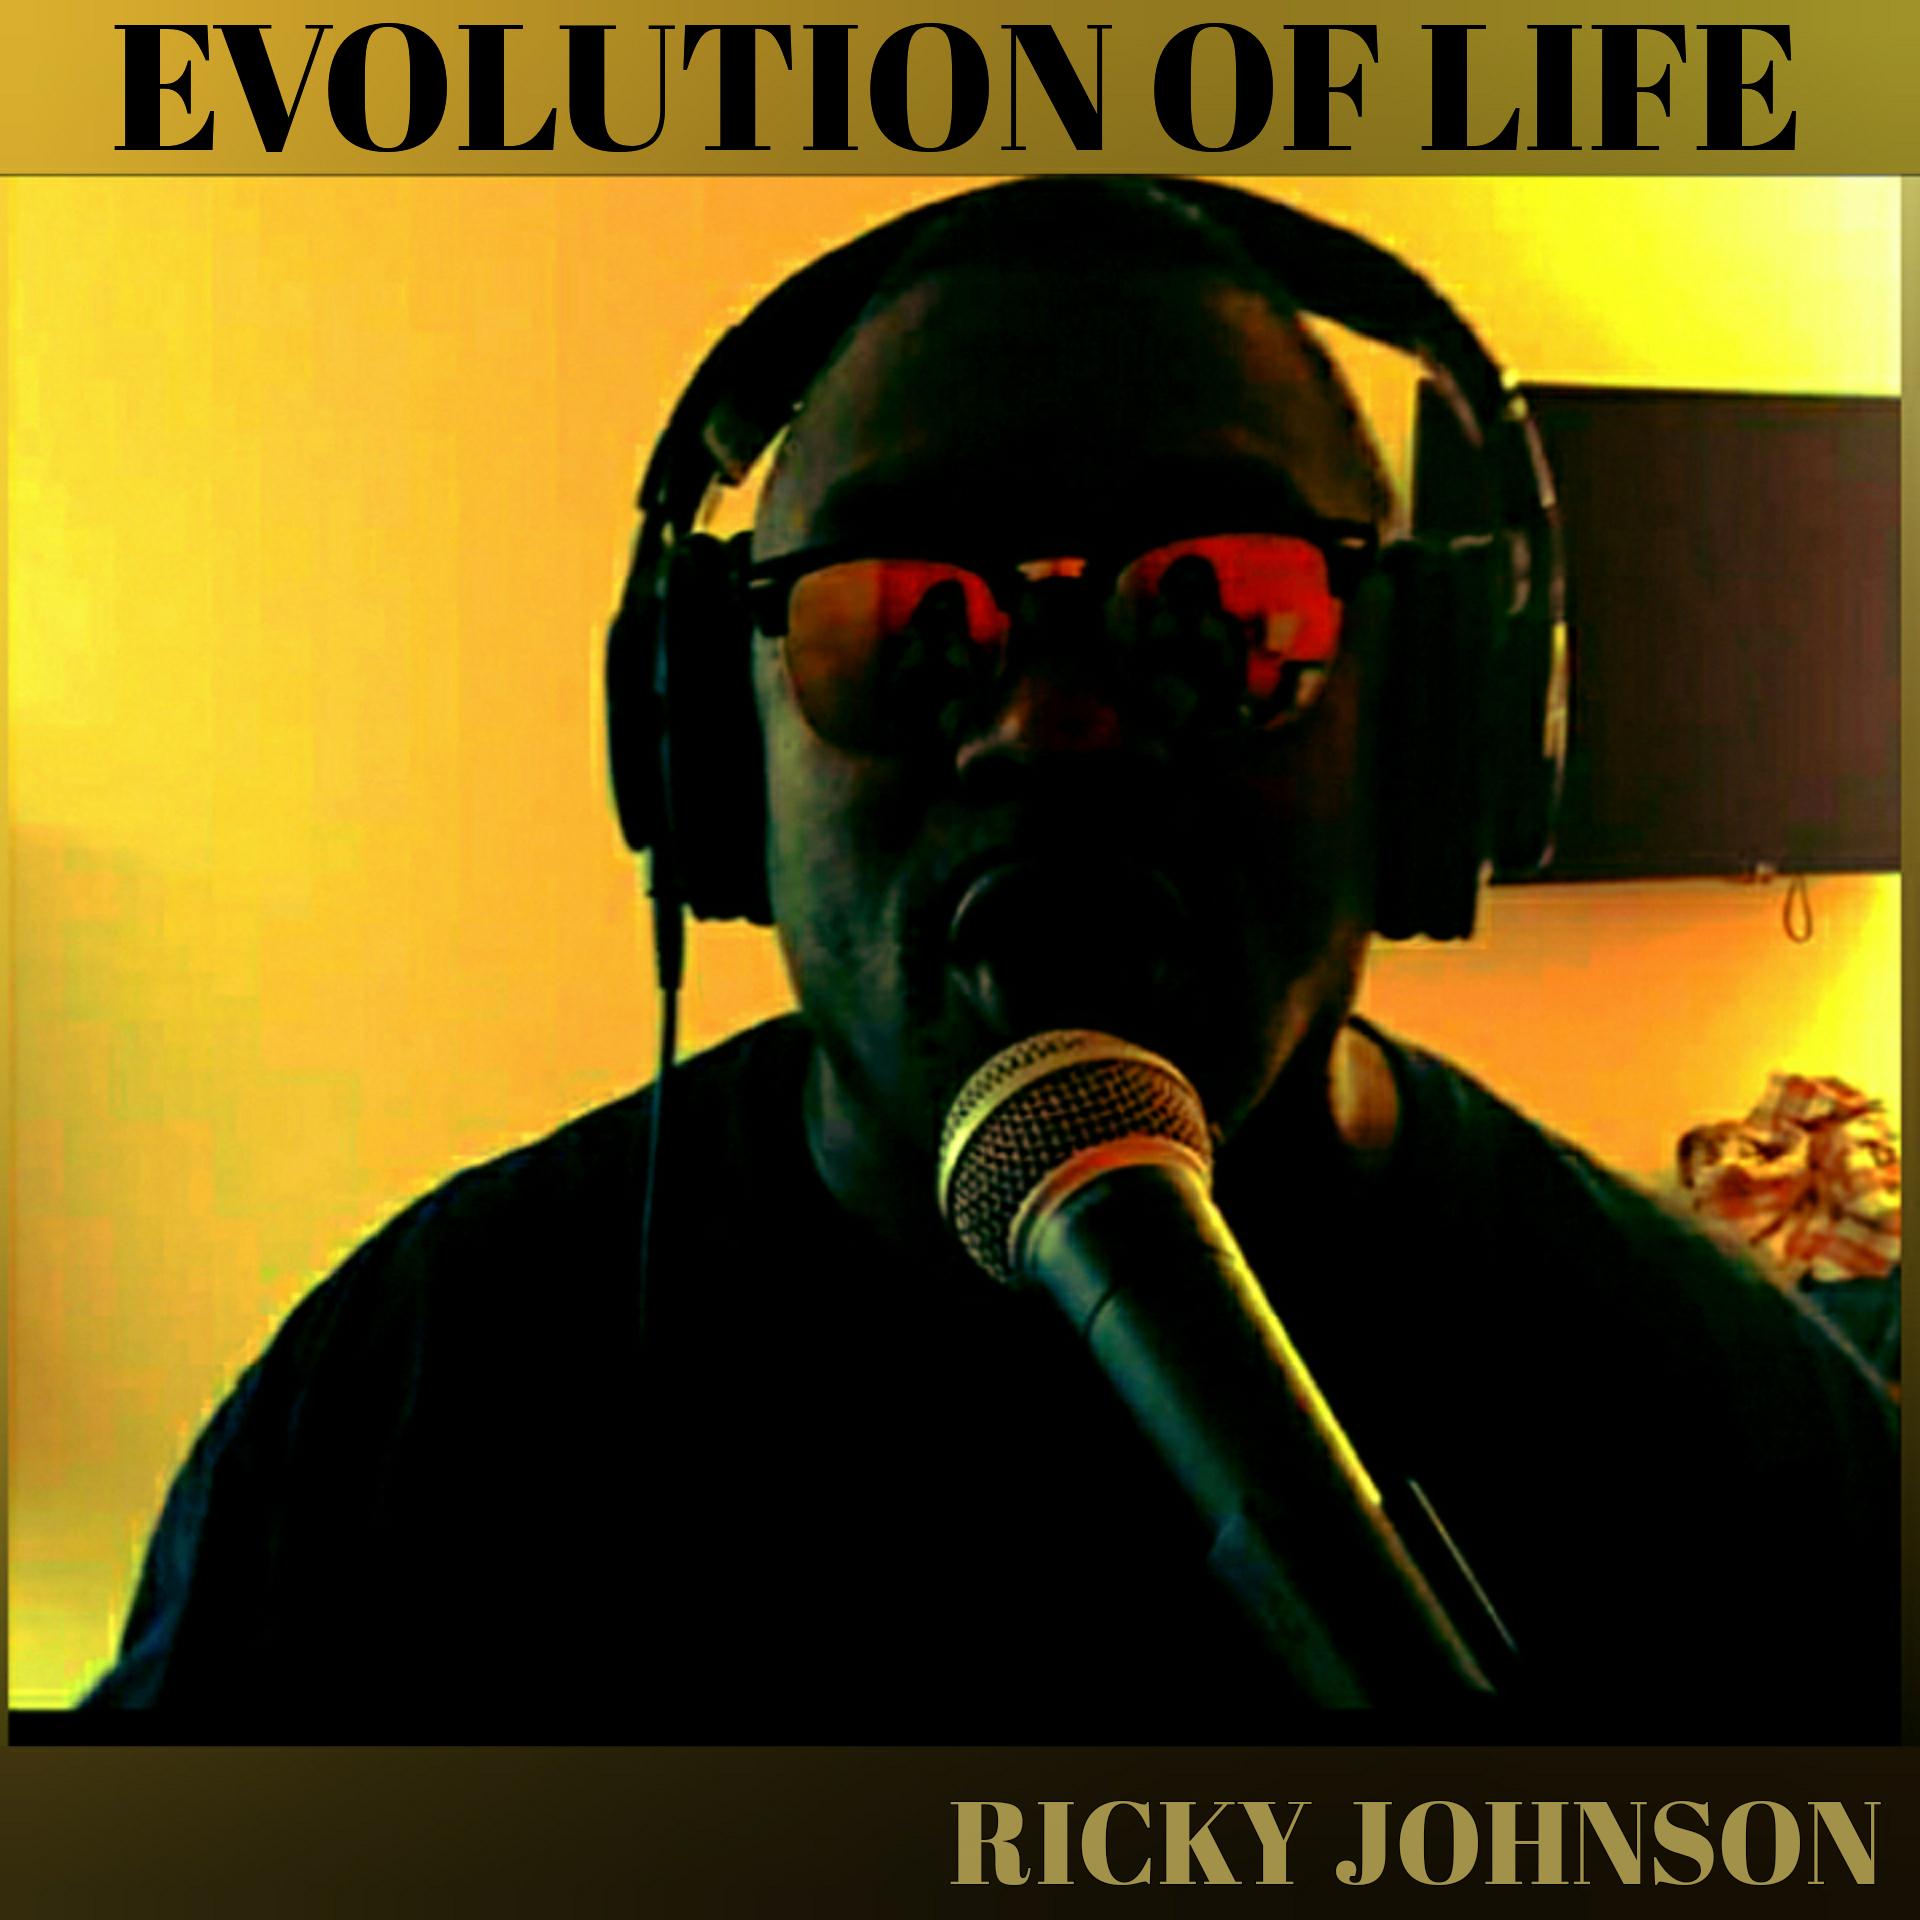 RICKY JOHNSON